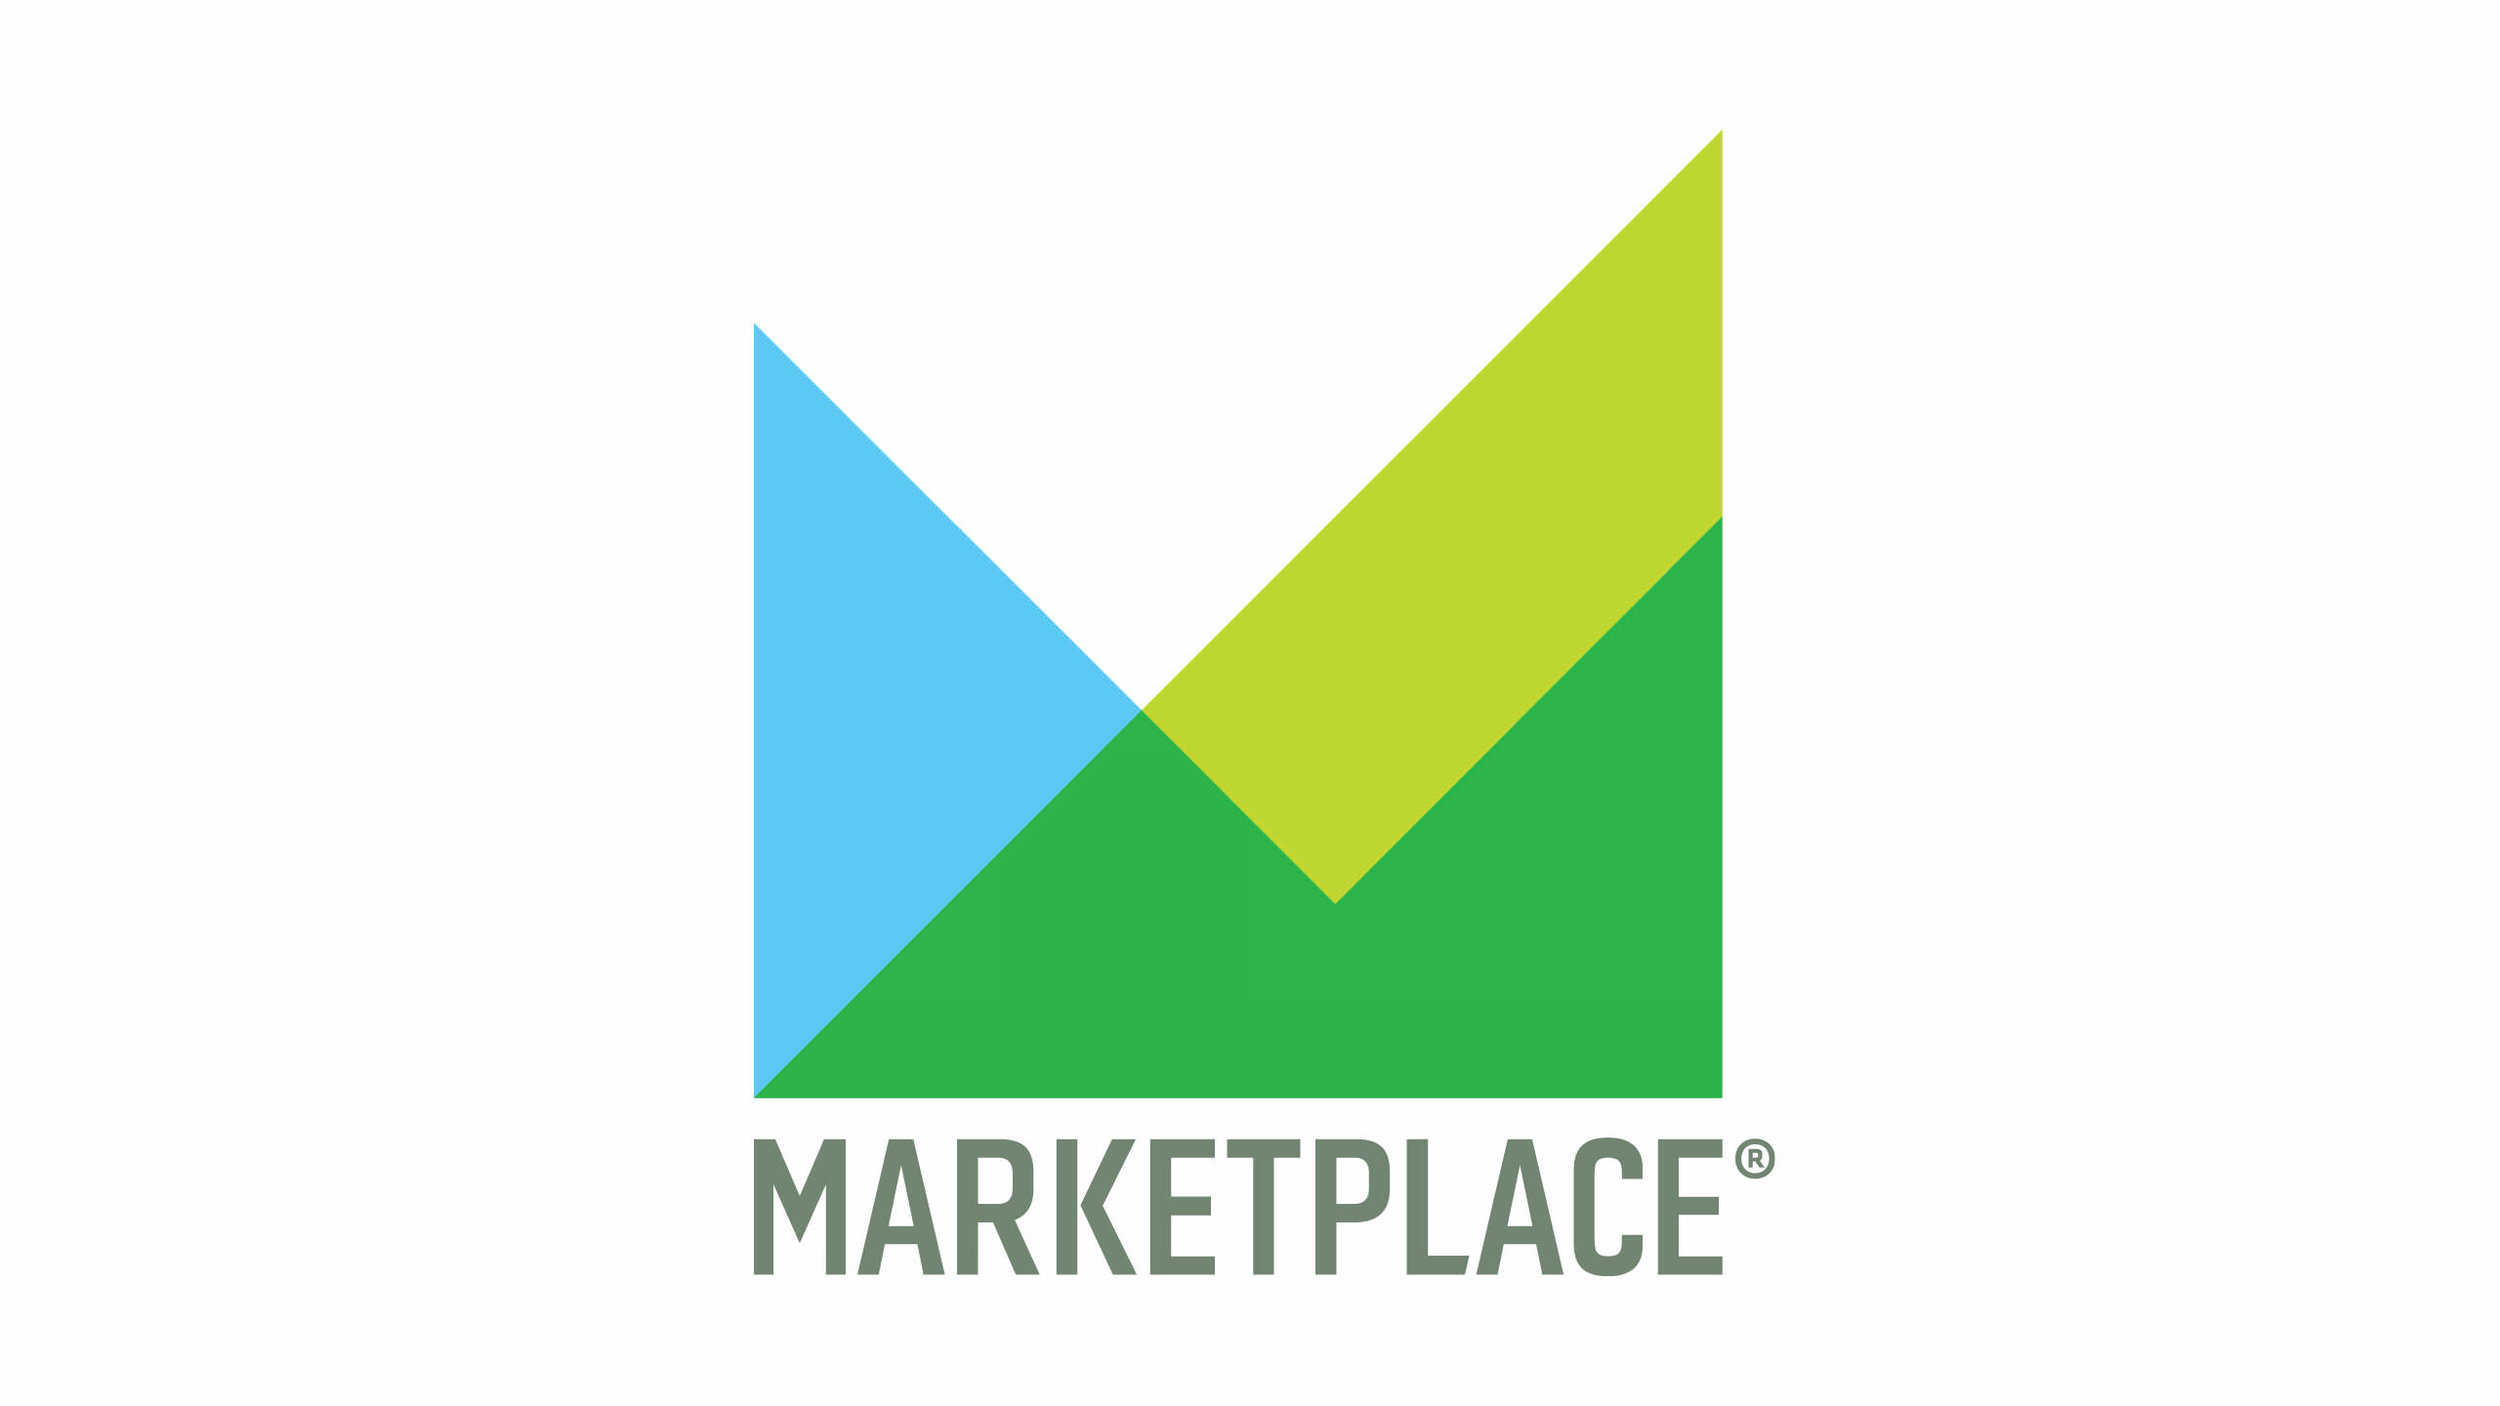 Marketplace Branding